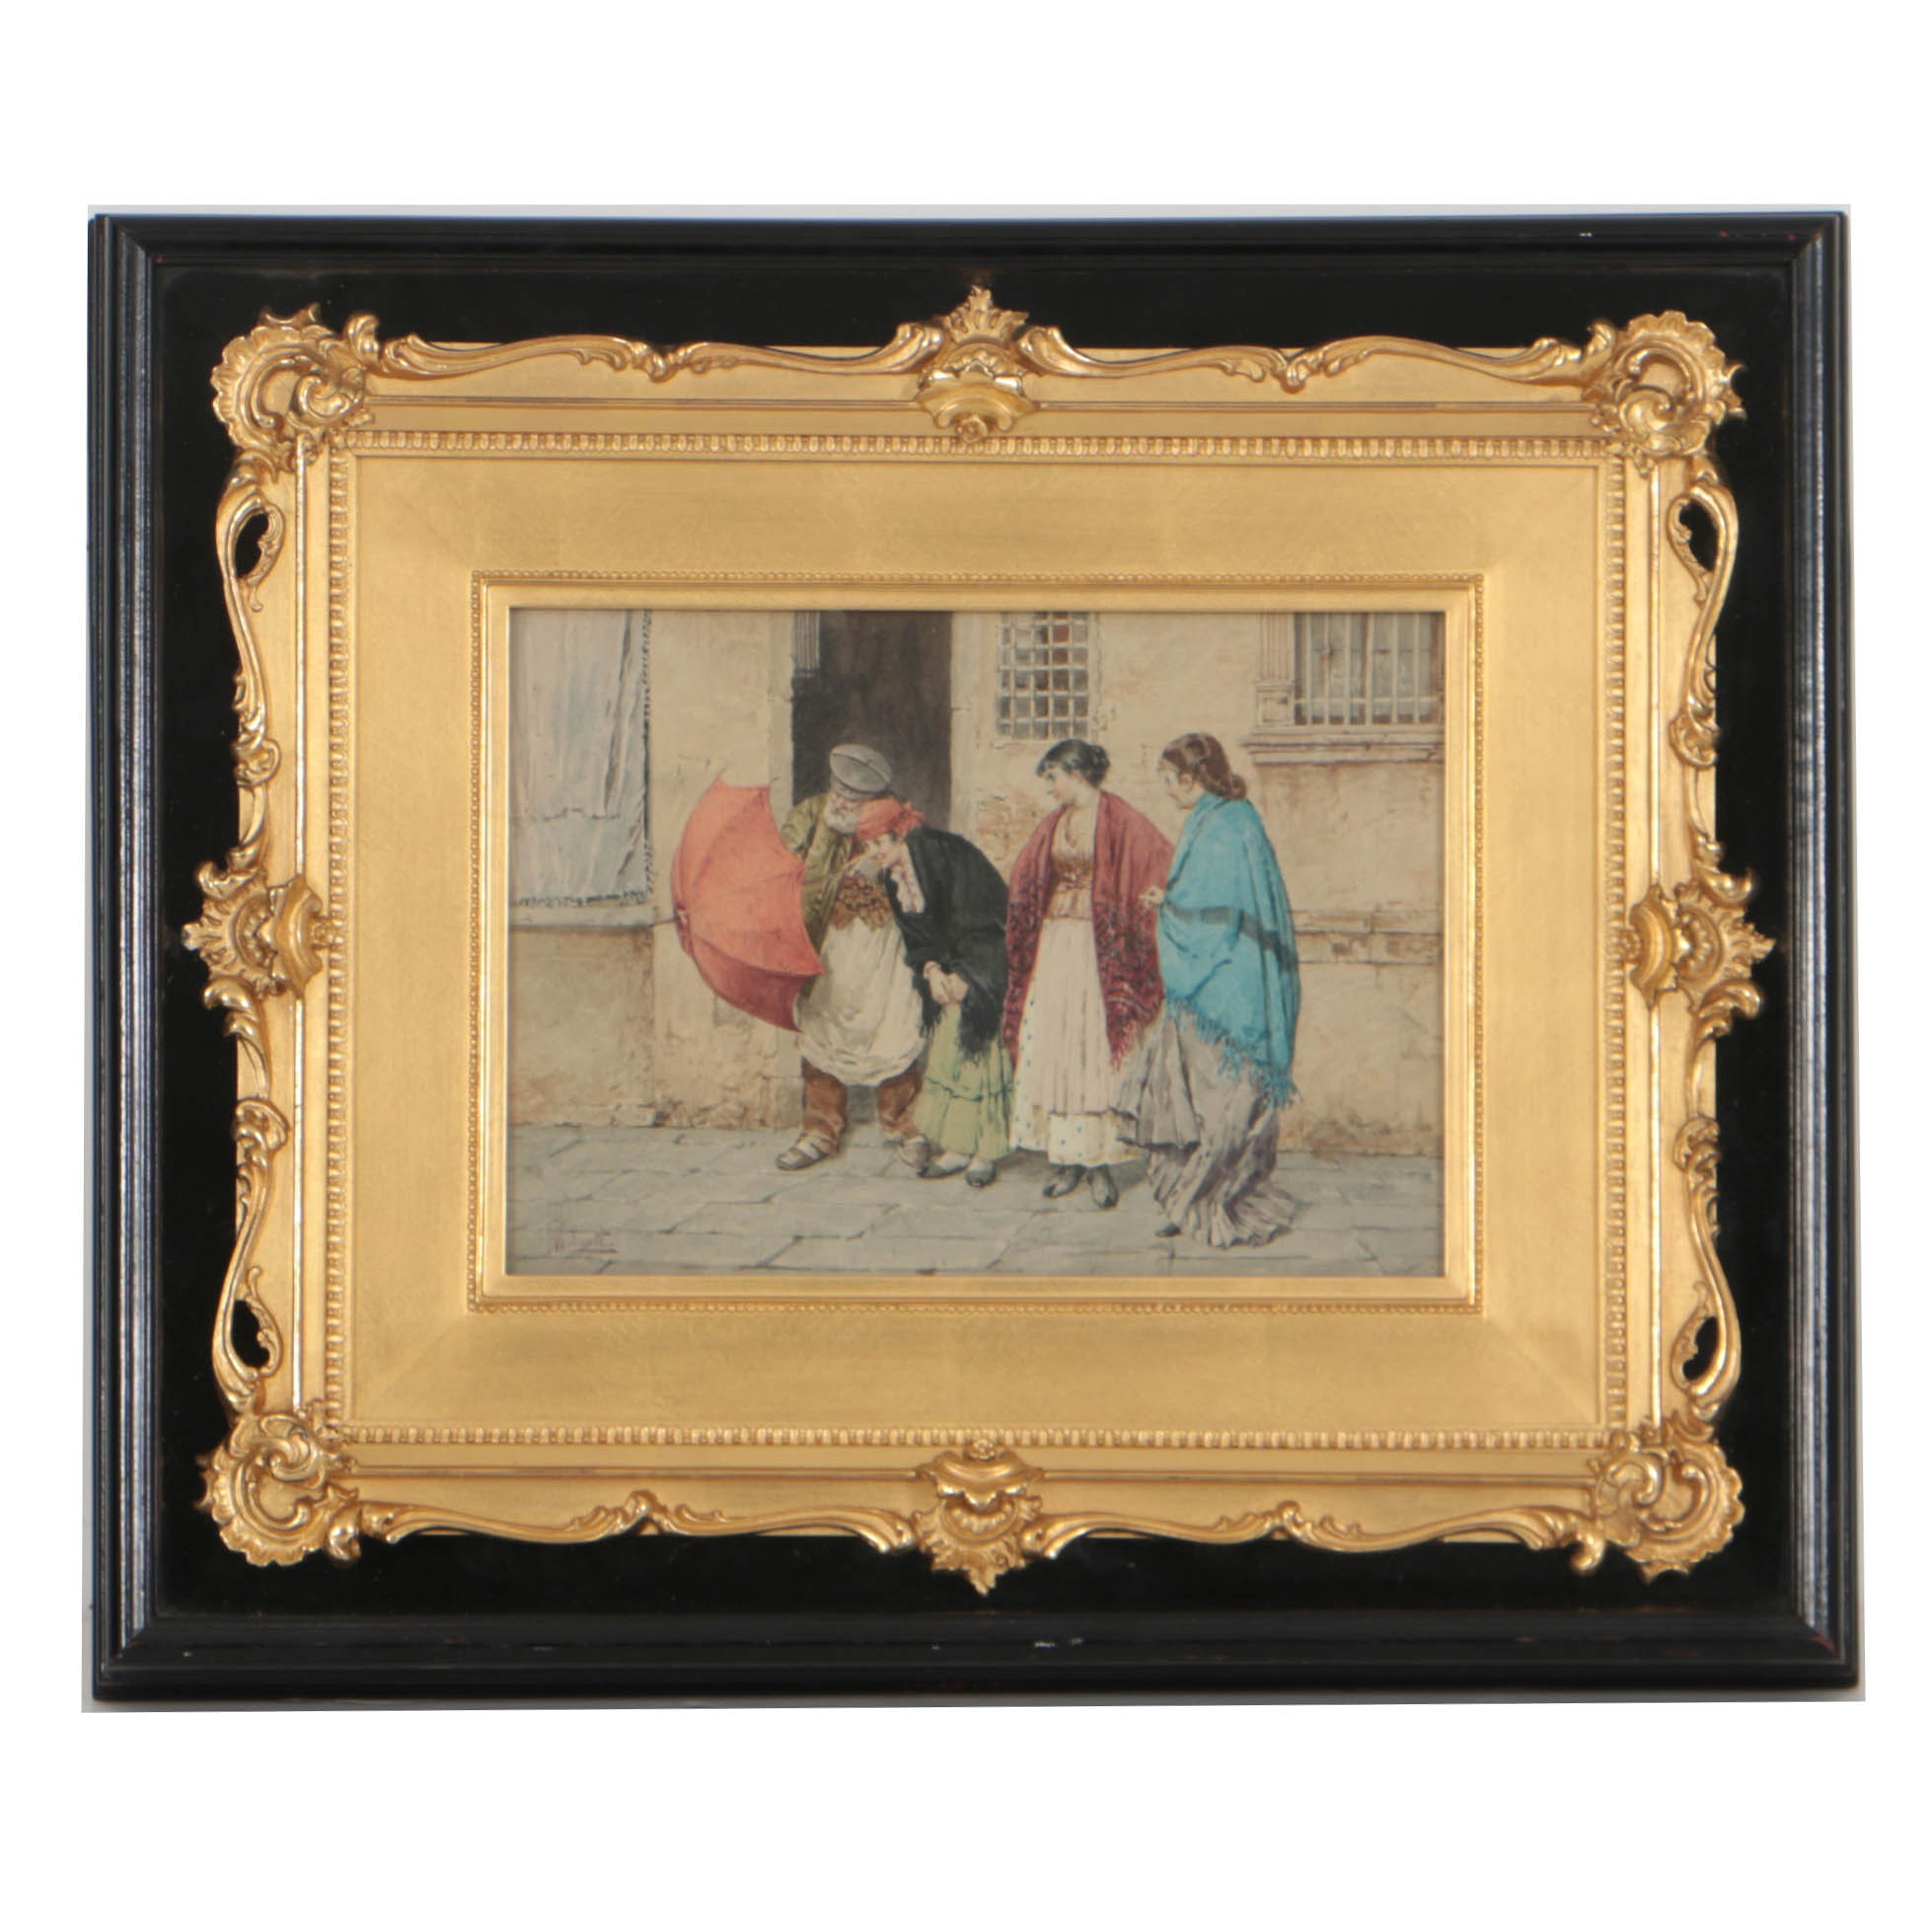 M. Roberti 19th Century Watercolor on Paper of Gypsies